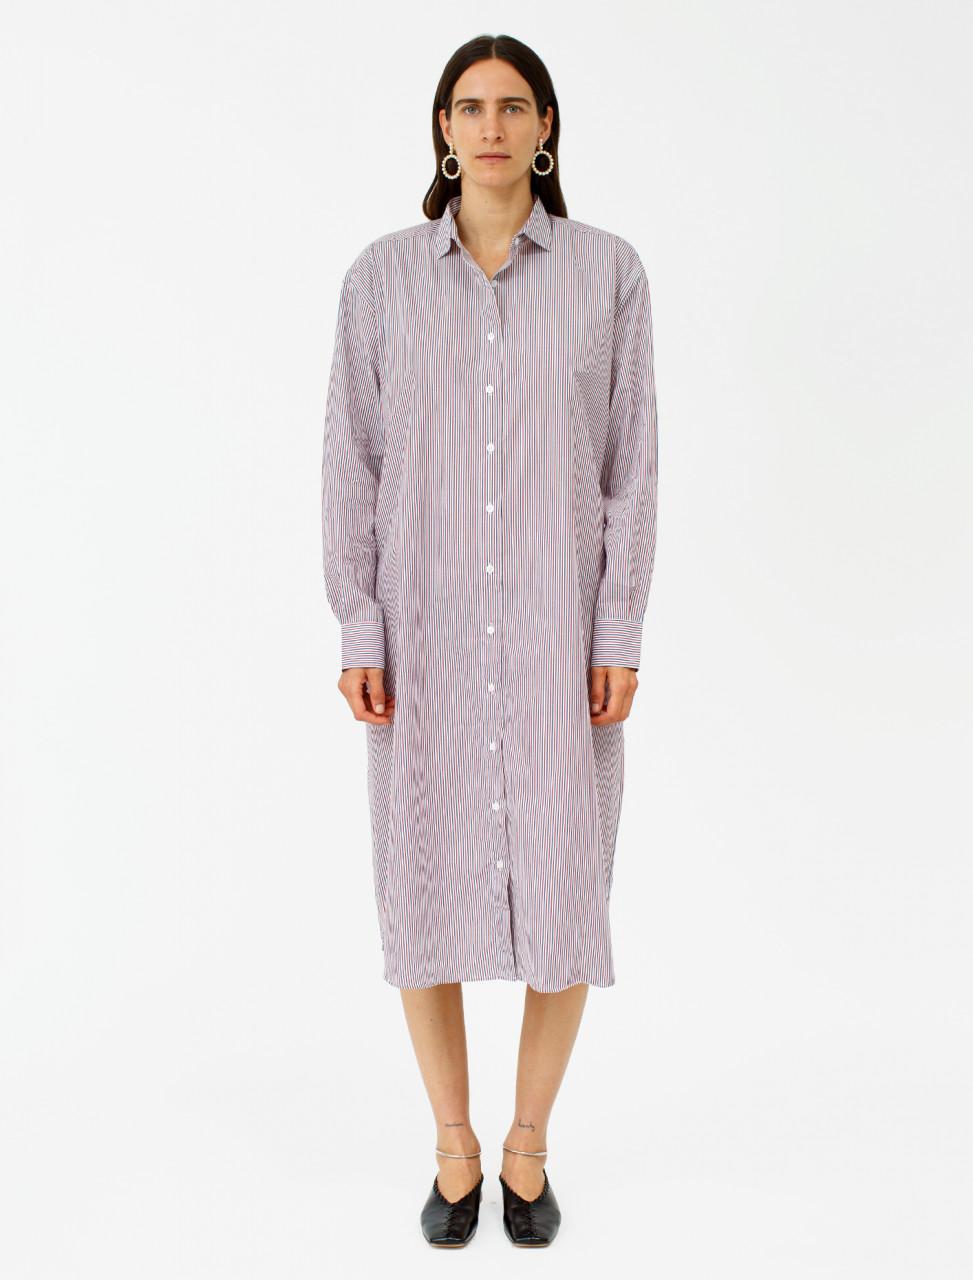 Ole Shirt Dress